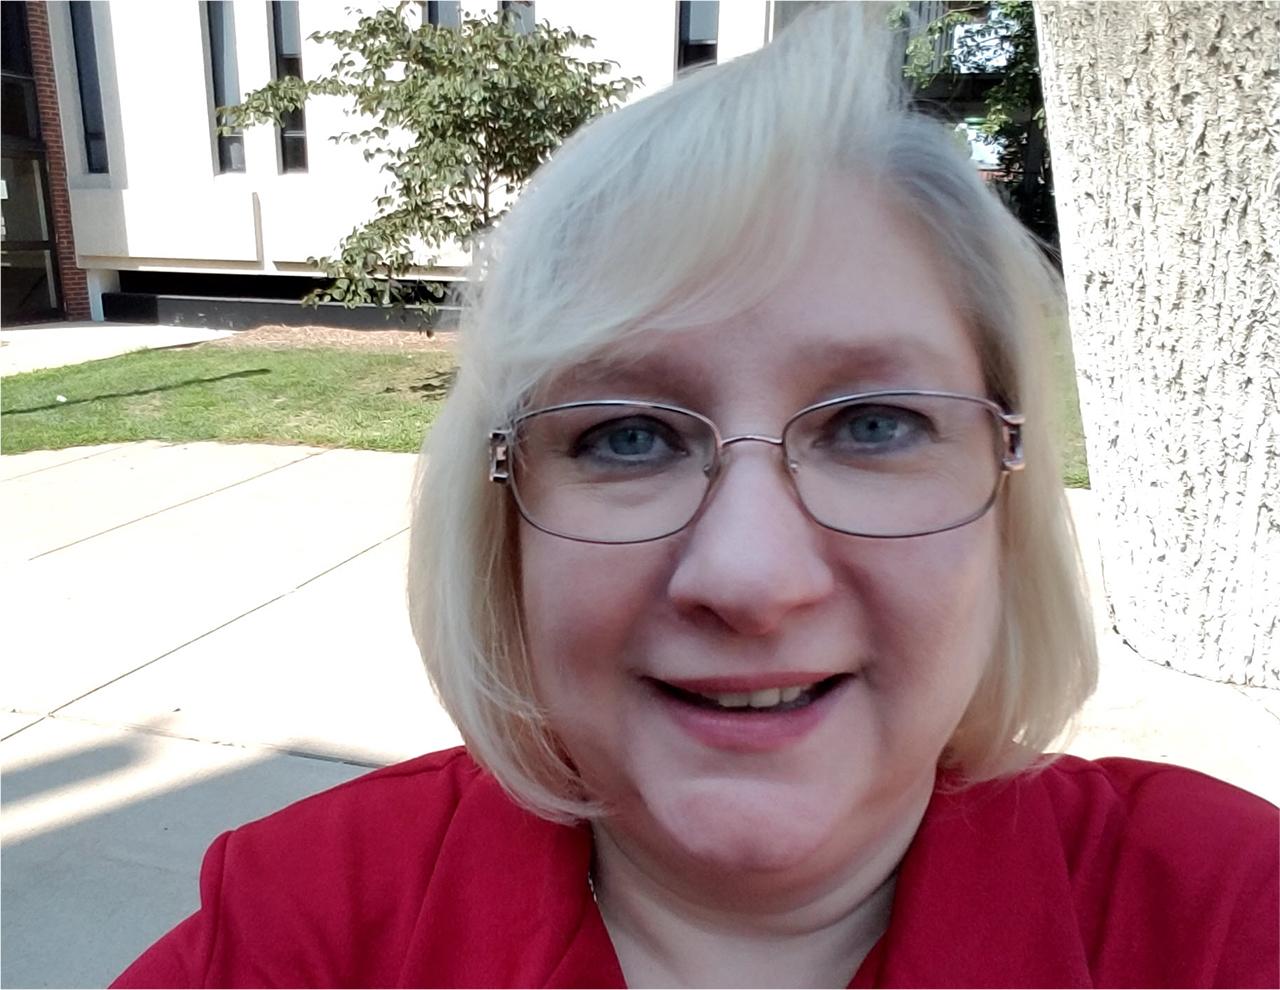 Pam Burress standing outside